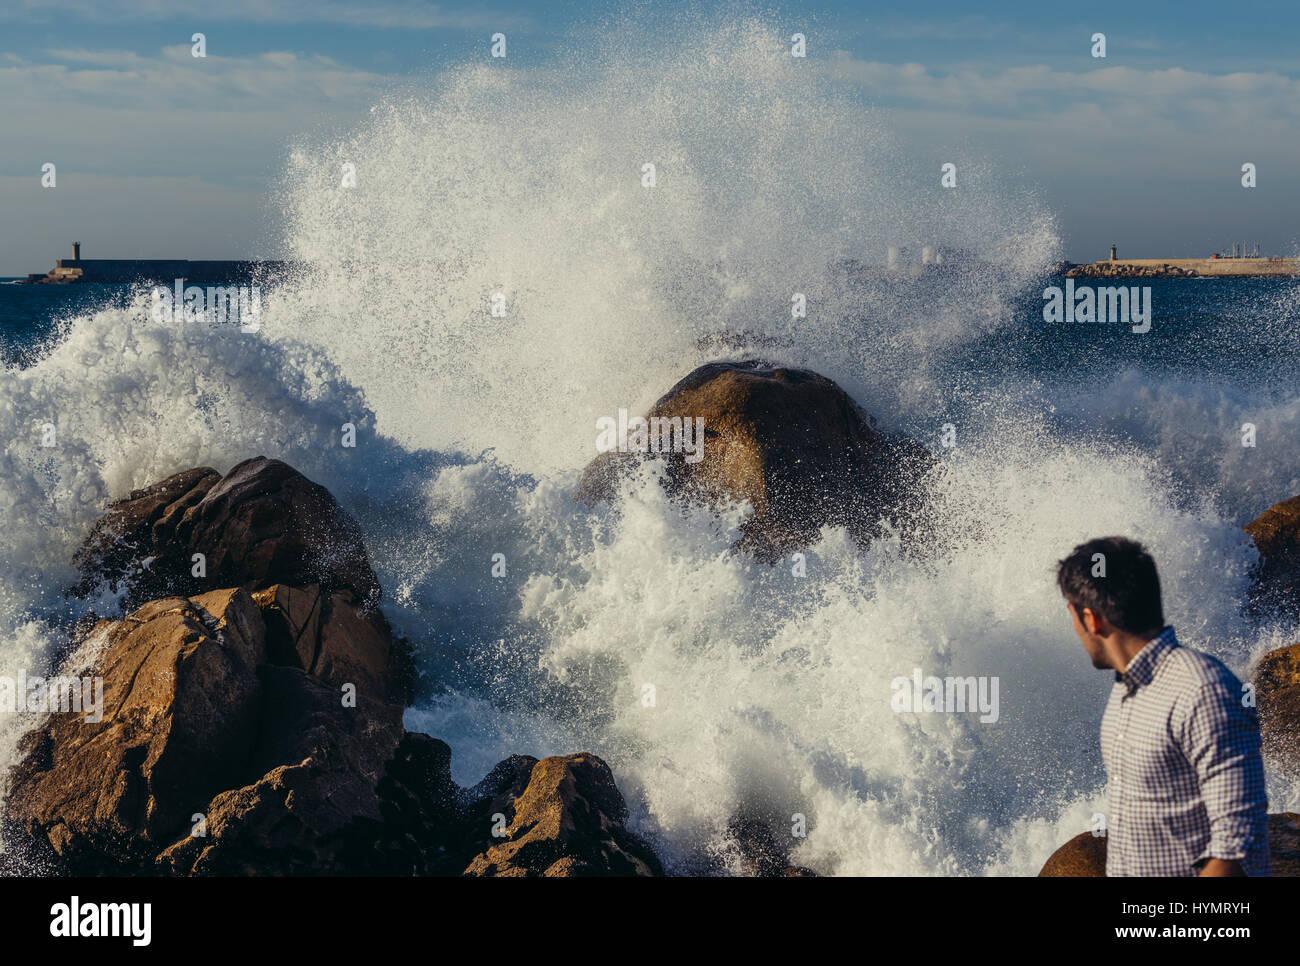 Big waves smashing on rocks of Atlantic Ocean shore in Nevogilde civil parish of Porto, second largest city in Portugal - Stock Image